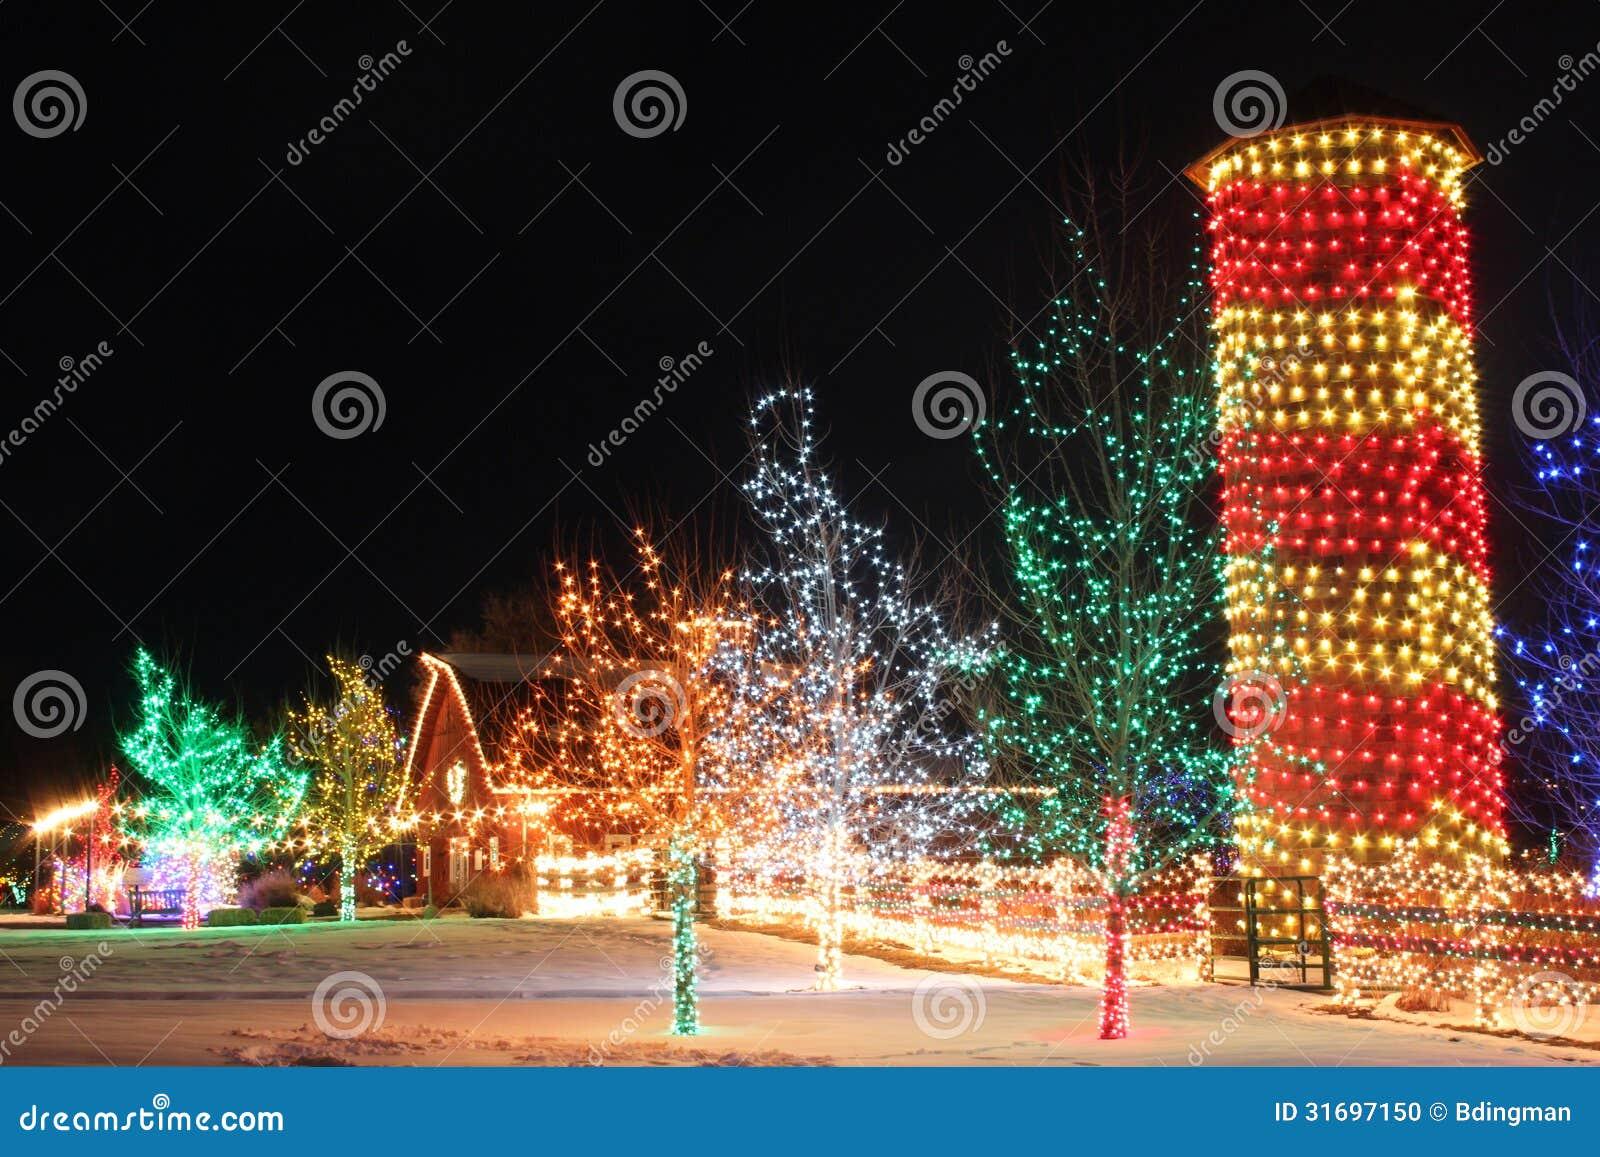 Christmas On The Farm Stock Photo Image Of Silo Colors